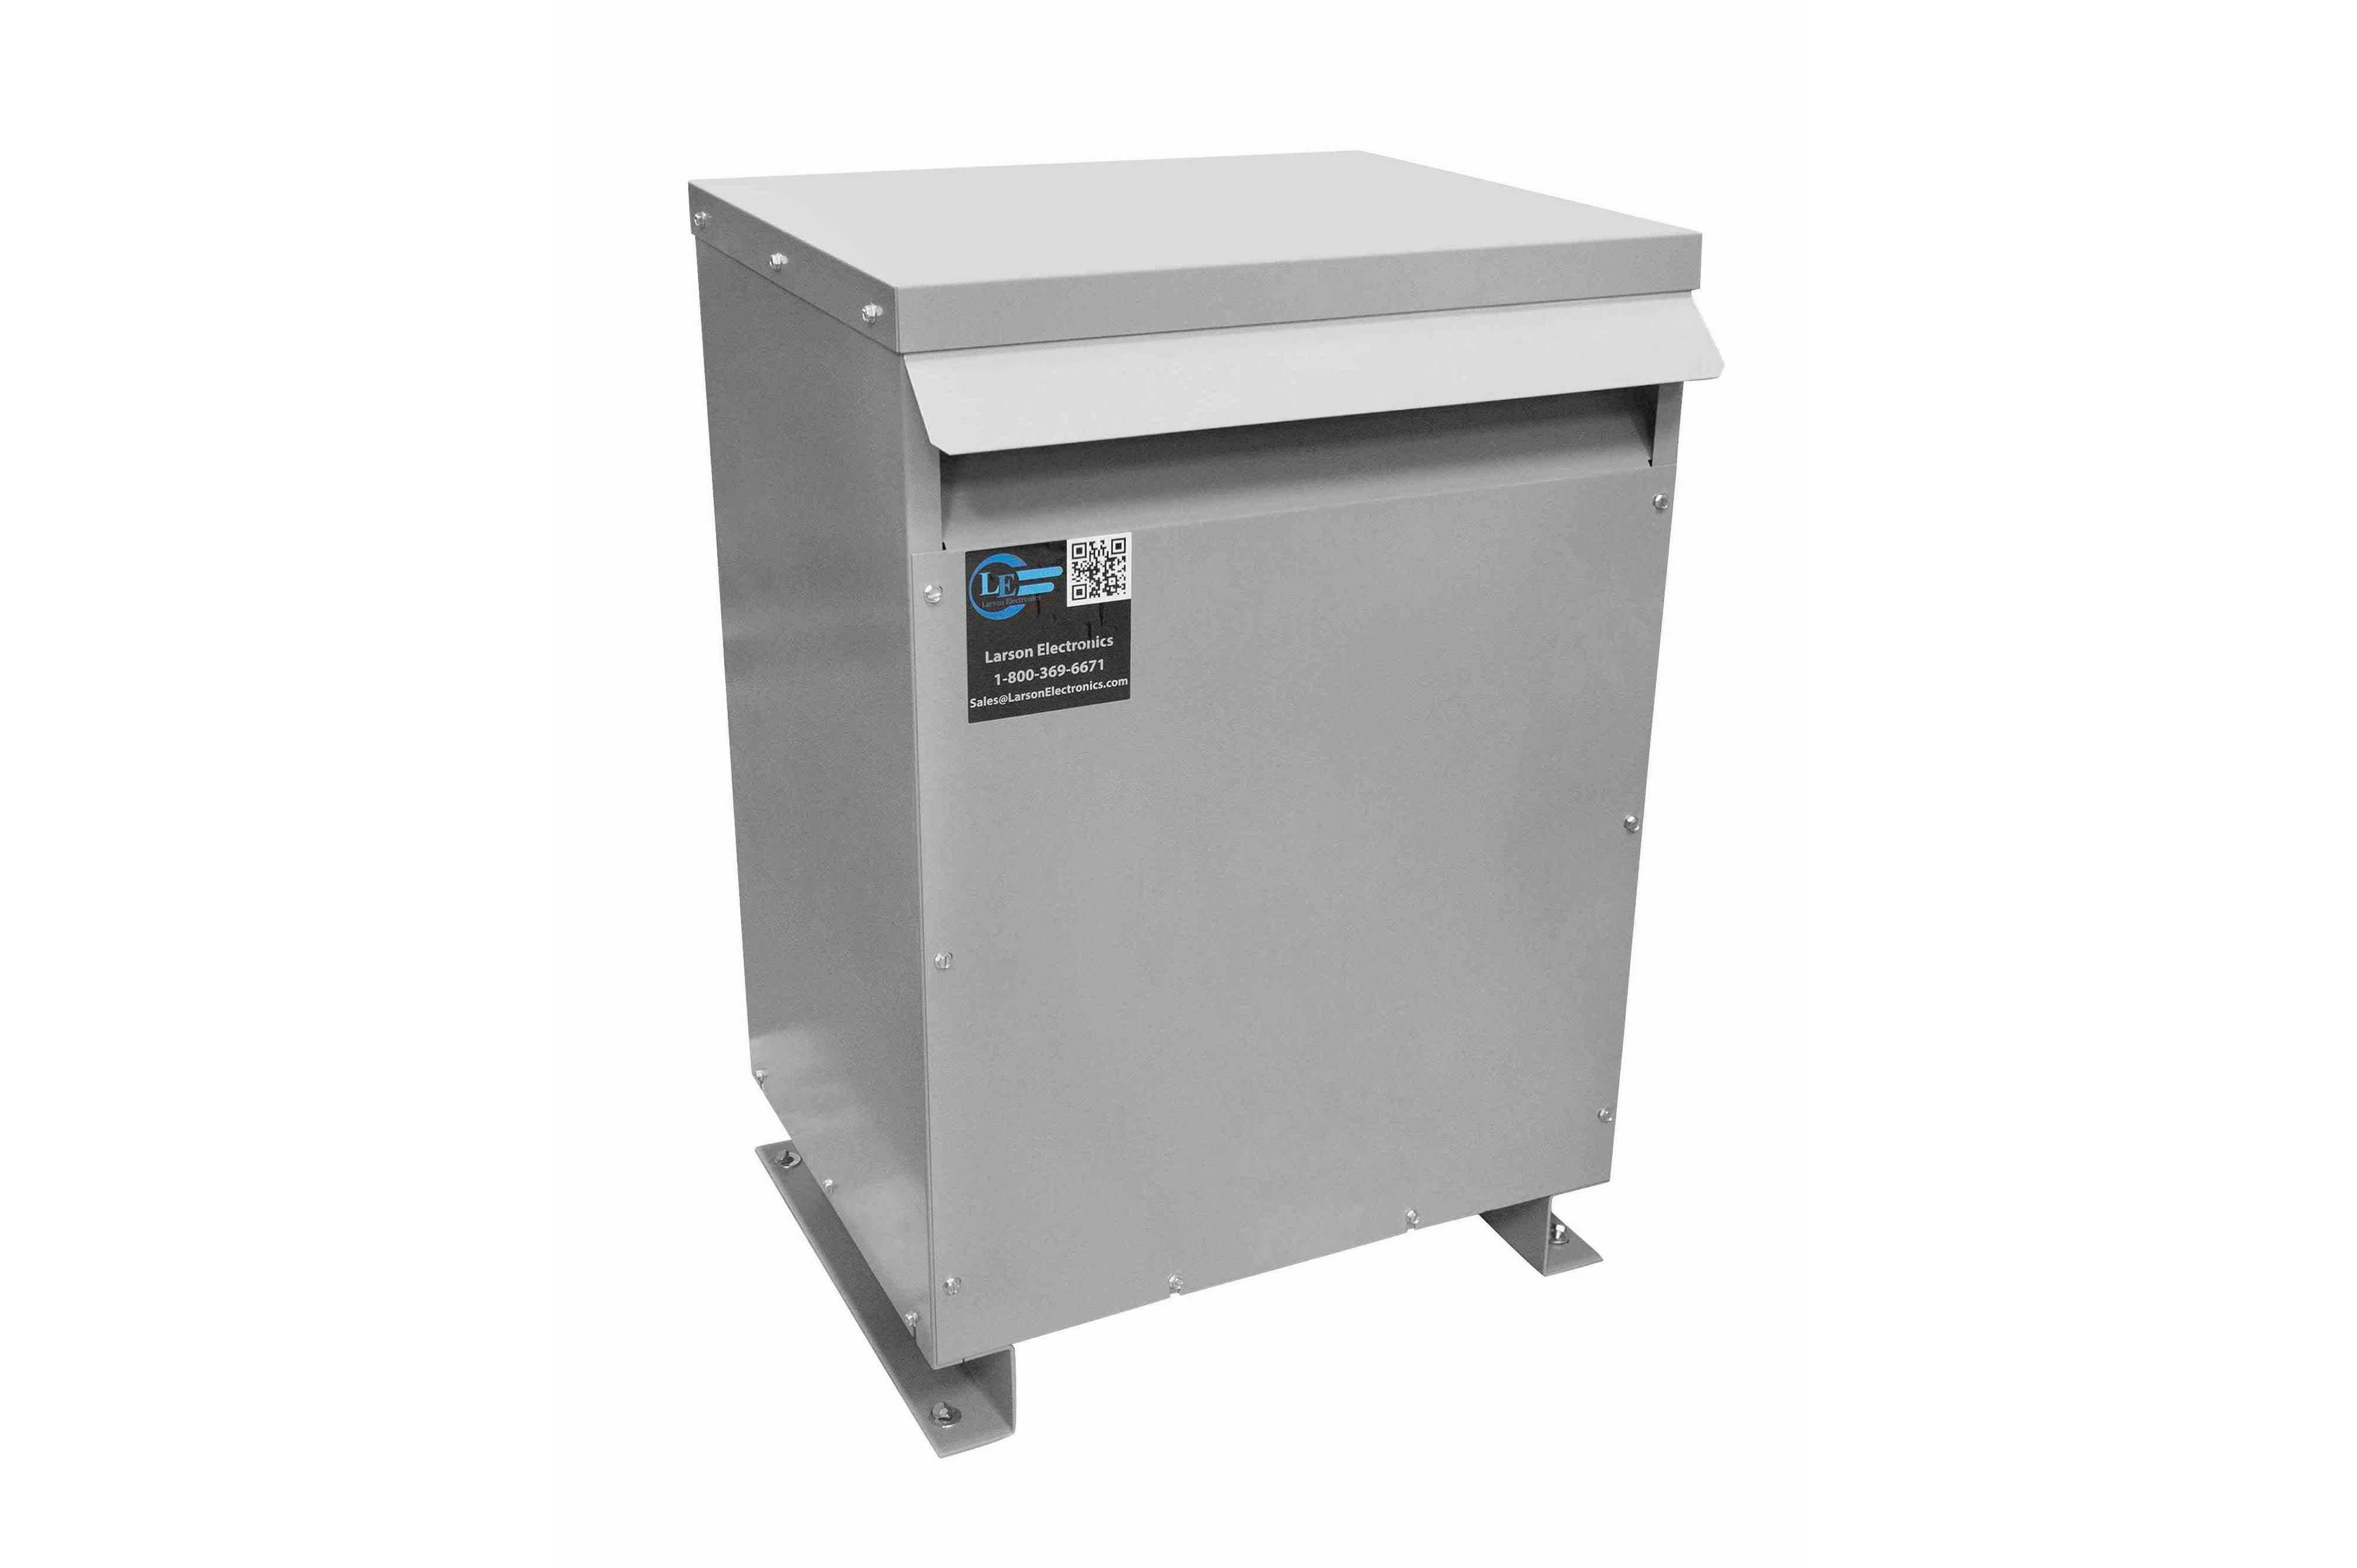 50 kVA 3PH Isolation Transformer, 460V Wye Primary, 415Y/240 Wye-N Secondary, N3R, Ventilated, 60 Hz